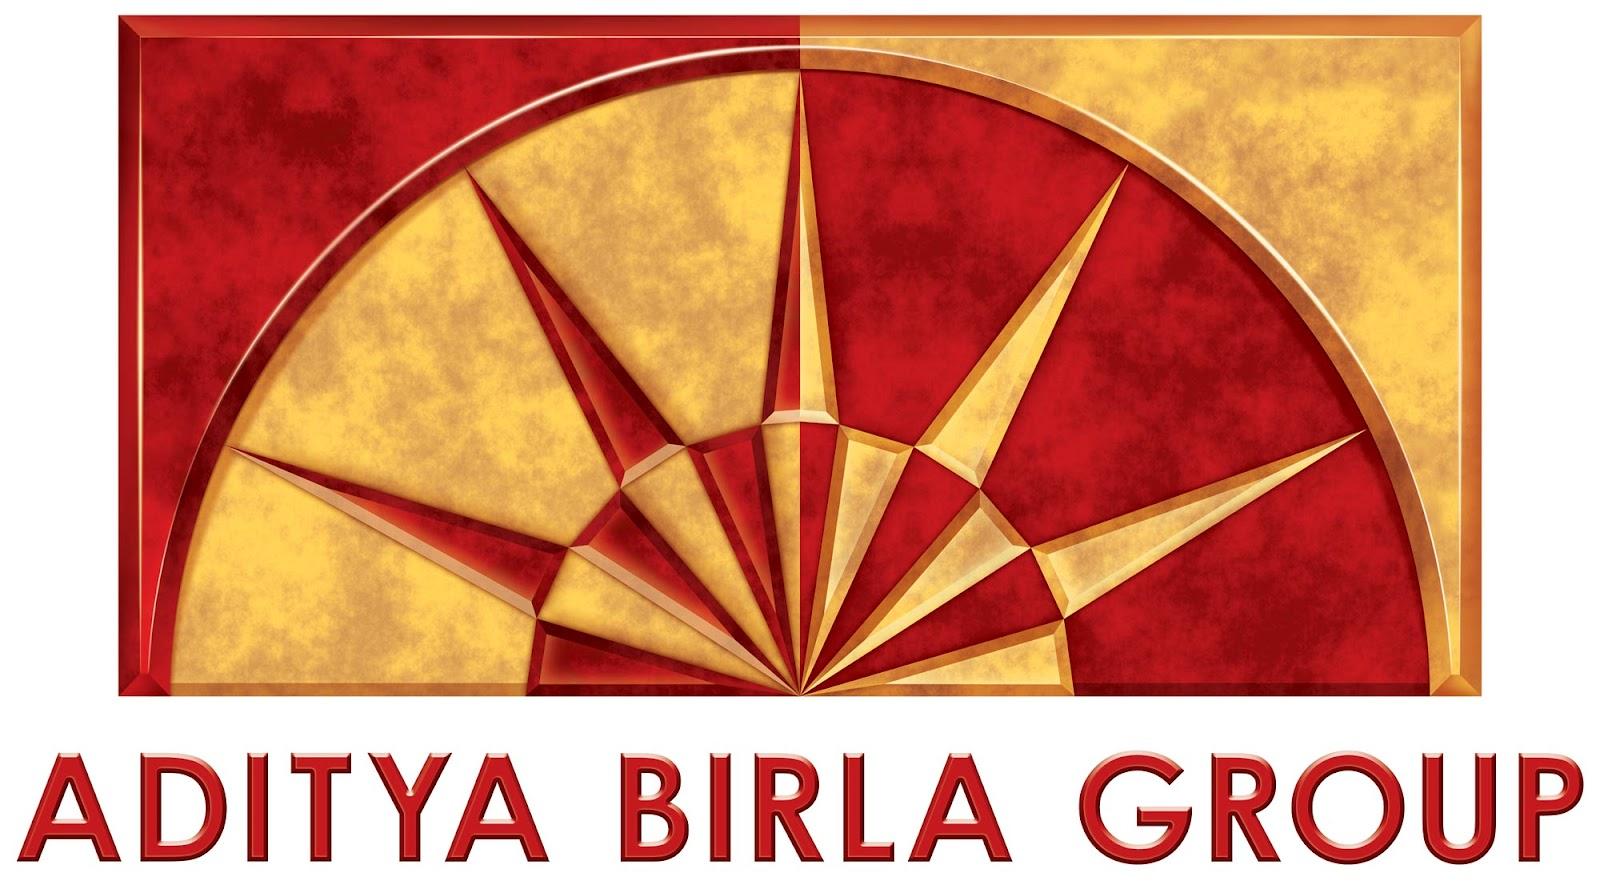 http://4.bp.blogspot.com/-LSlqufXmFXw/UCyADrKZWpI/AAAAAAAAEEs/ybYpMrxSnt8/s1600/3d_aditya+birla+group+logo.jpg